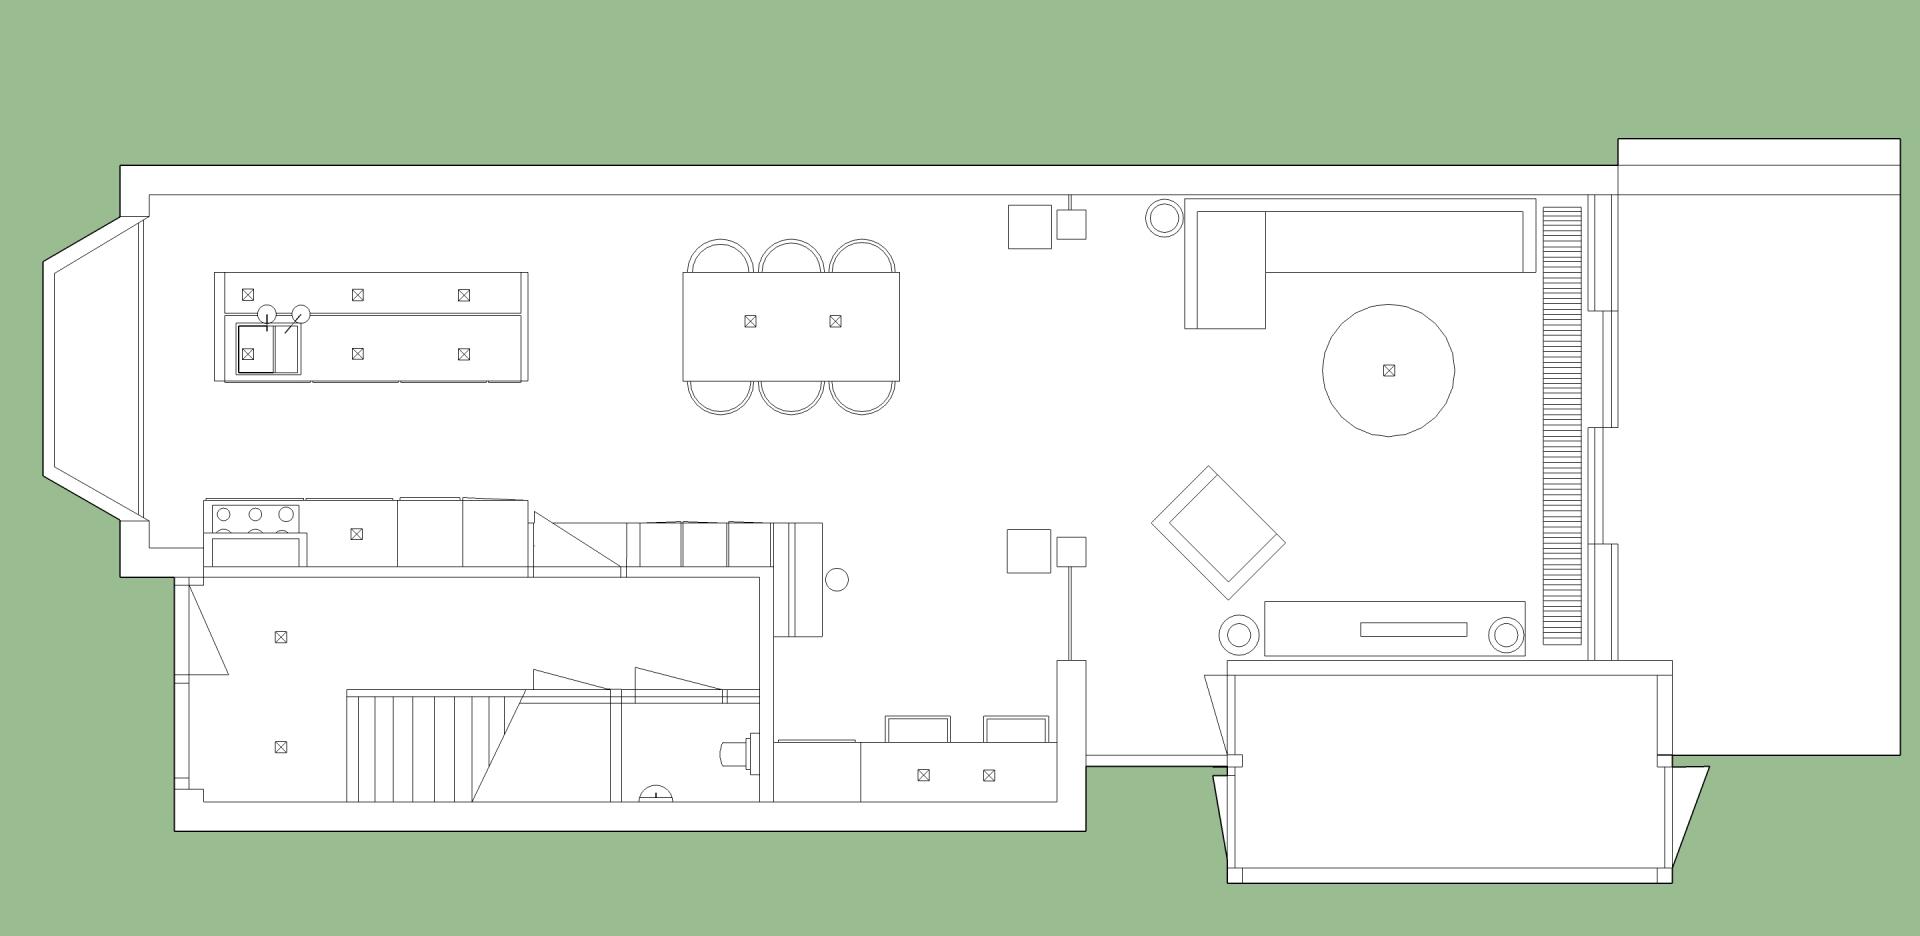 Interieuradvies interieurontwerp benedenverdieping amersfoort jaren 20 woning sbz for Interieurontwerp